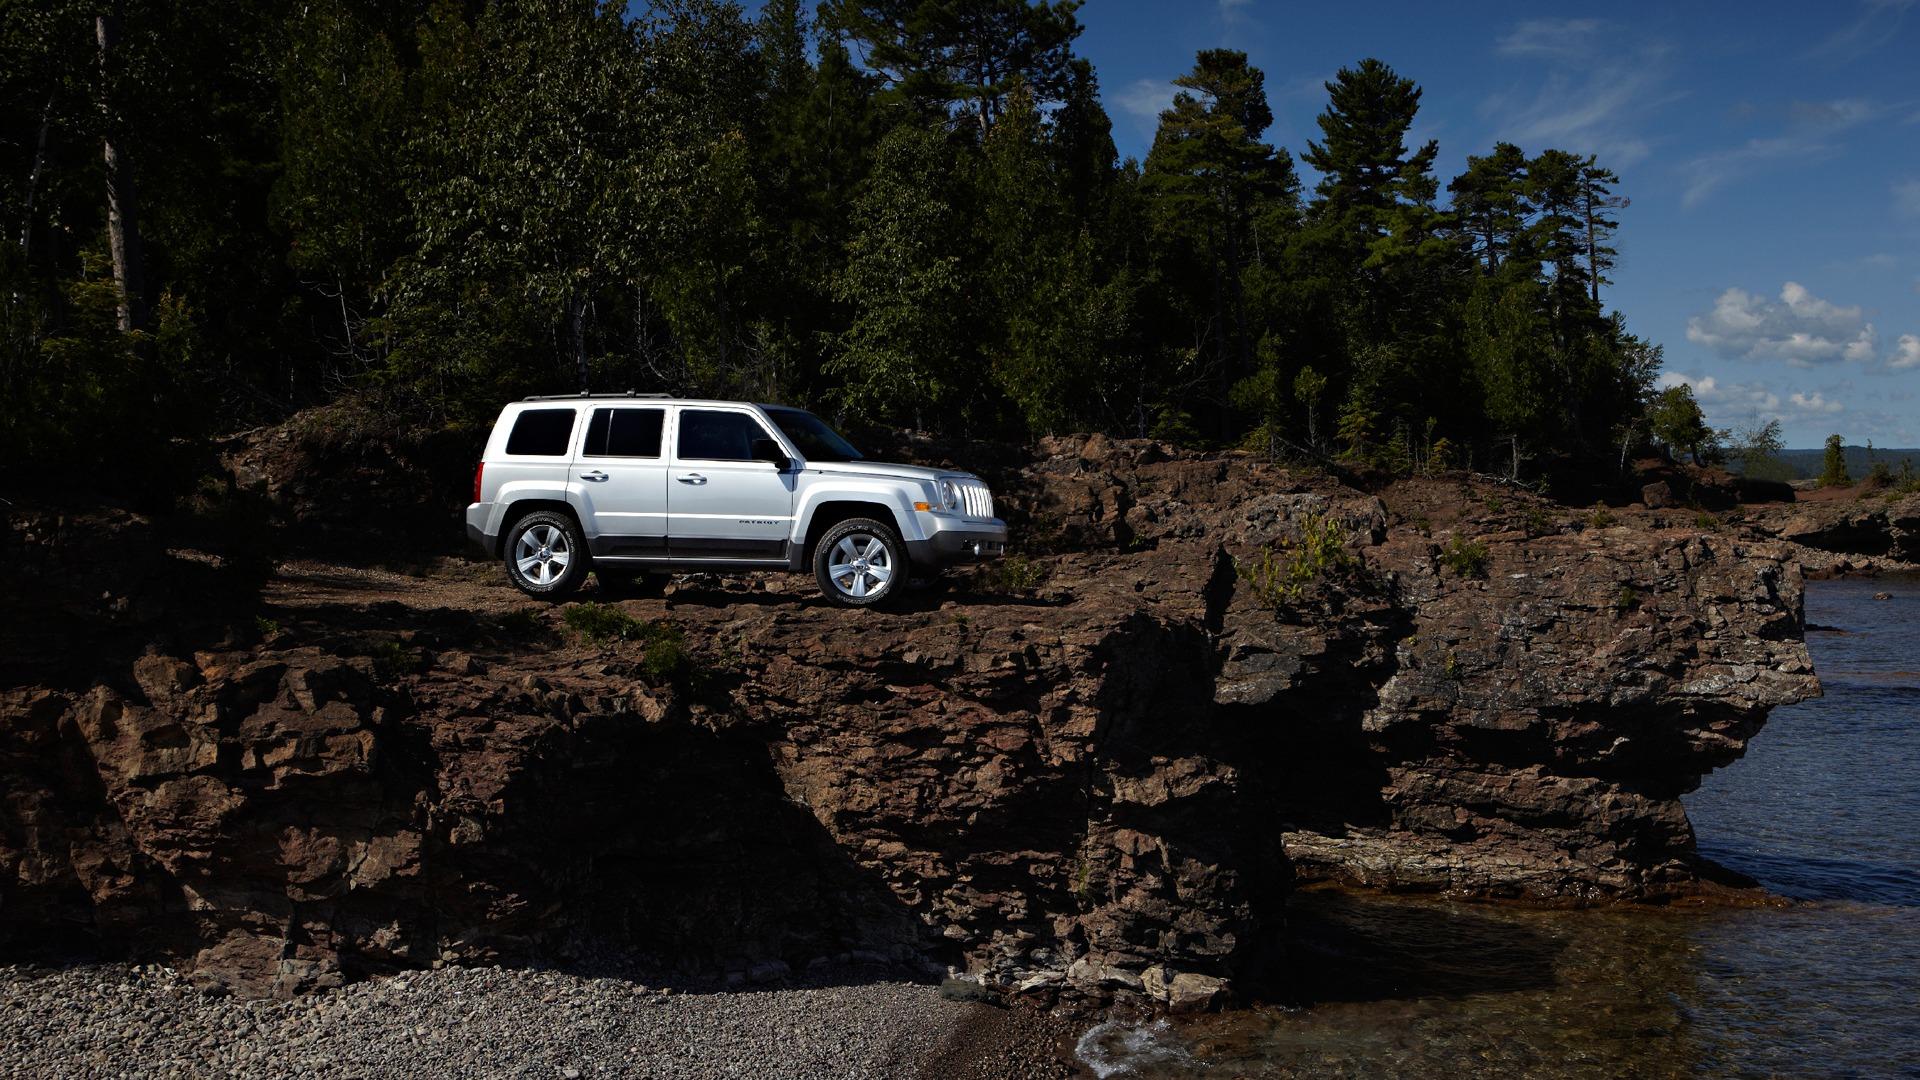 Jeep Patriot 2011 Hd Wallpaper 9 1920x1080 Wallpaper Download Jeep Patriot 2011 Hd Wallpaper Auto Wallpapers V3 Wallpaper Site